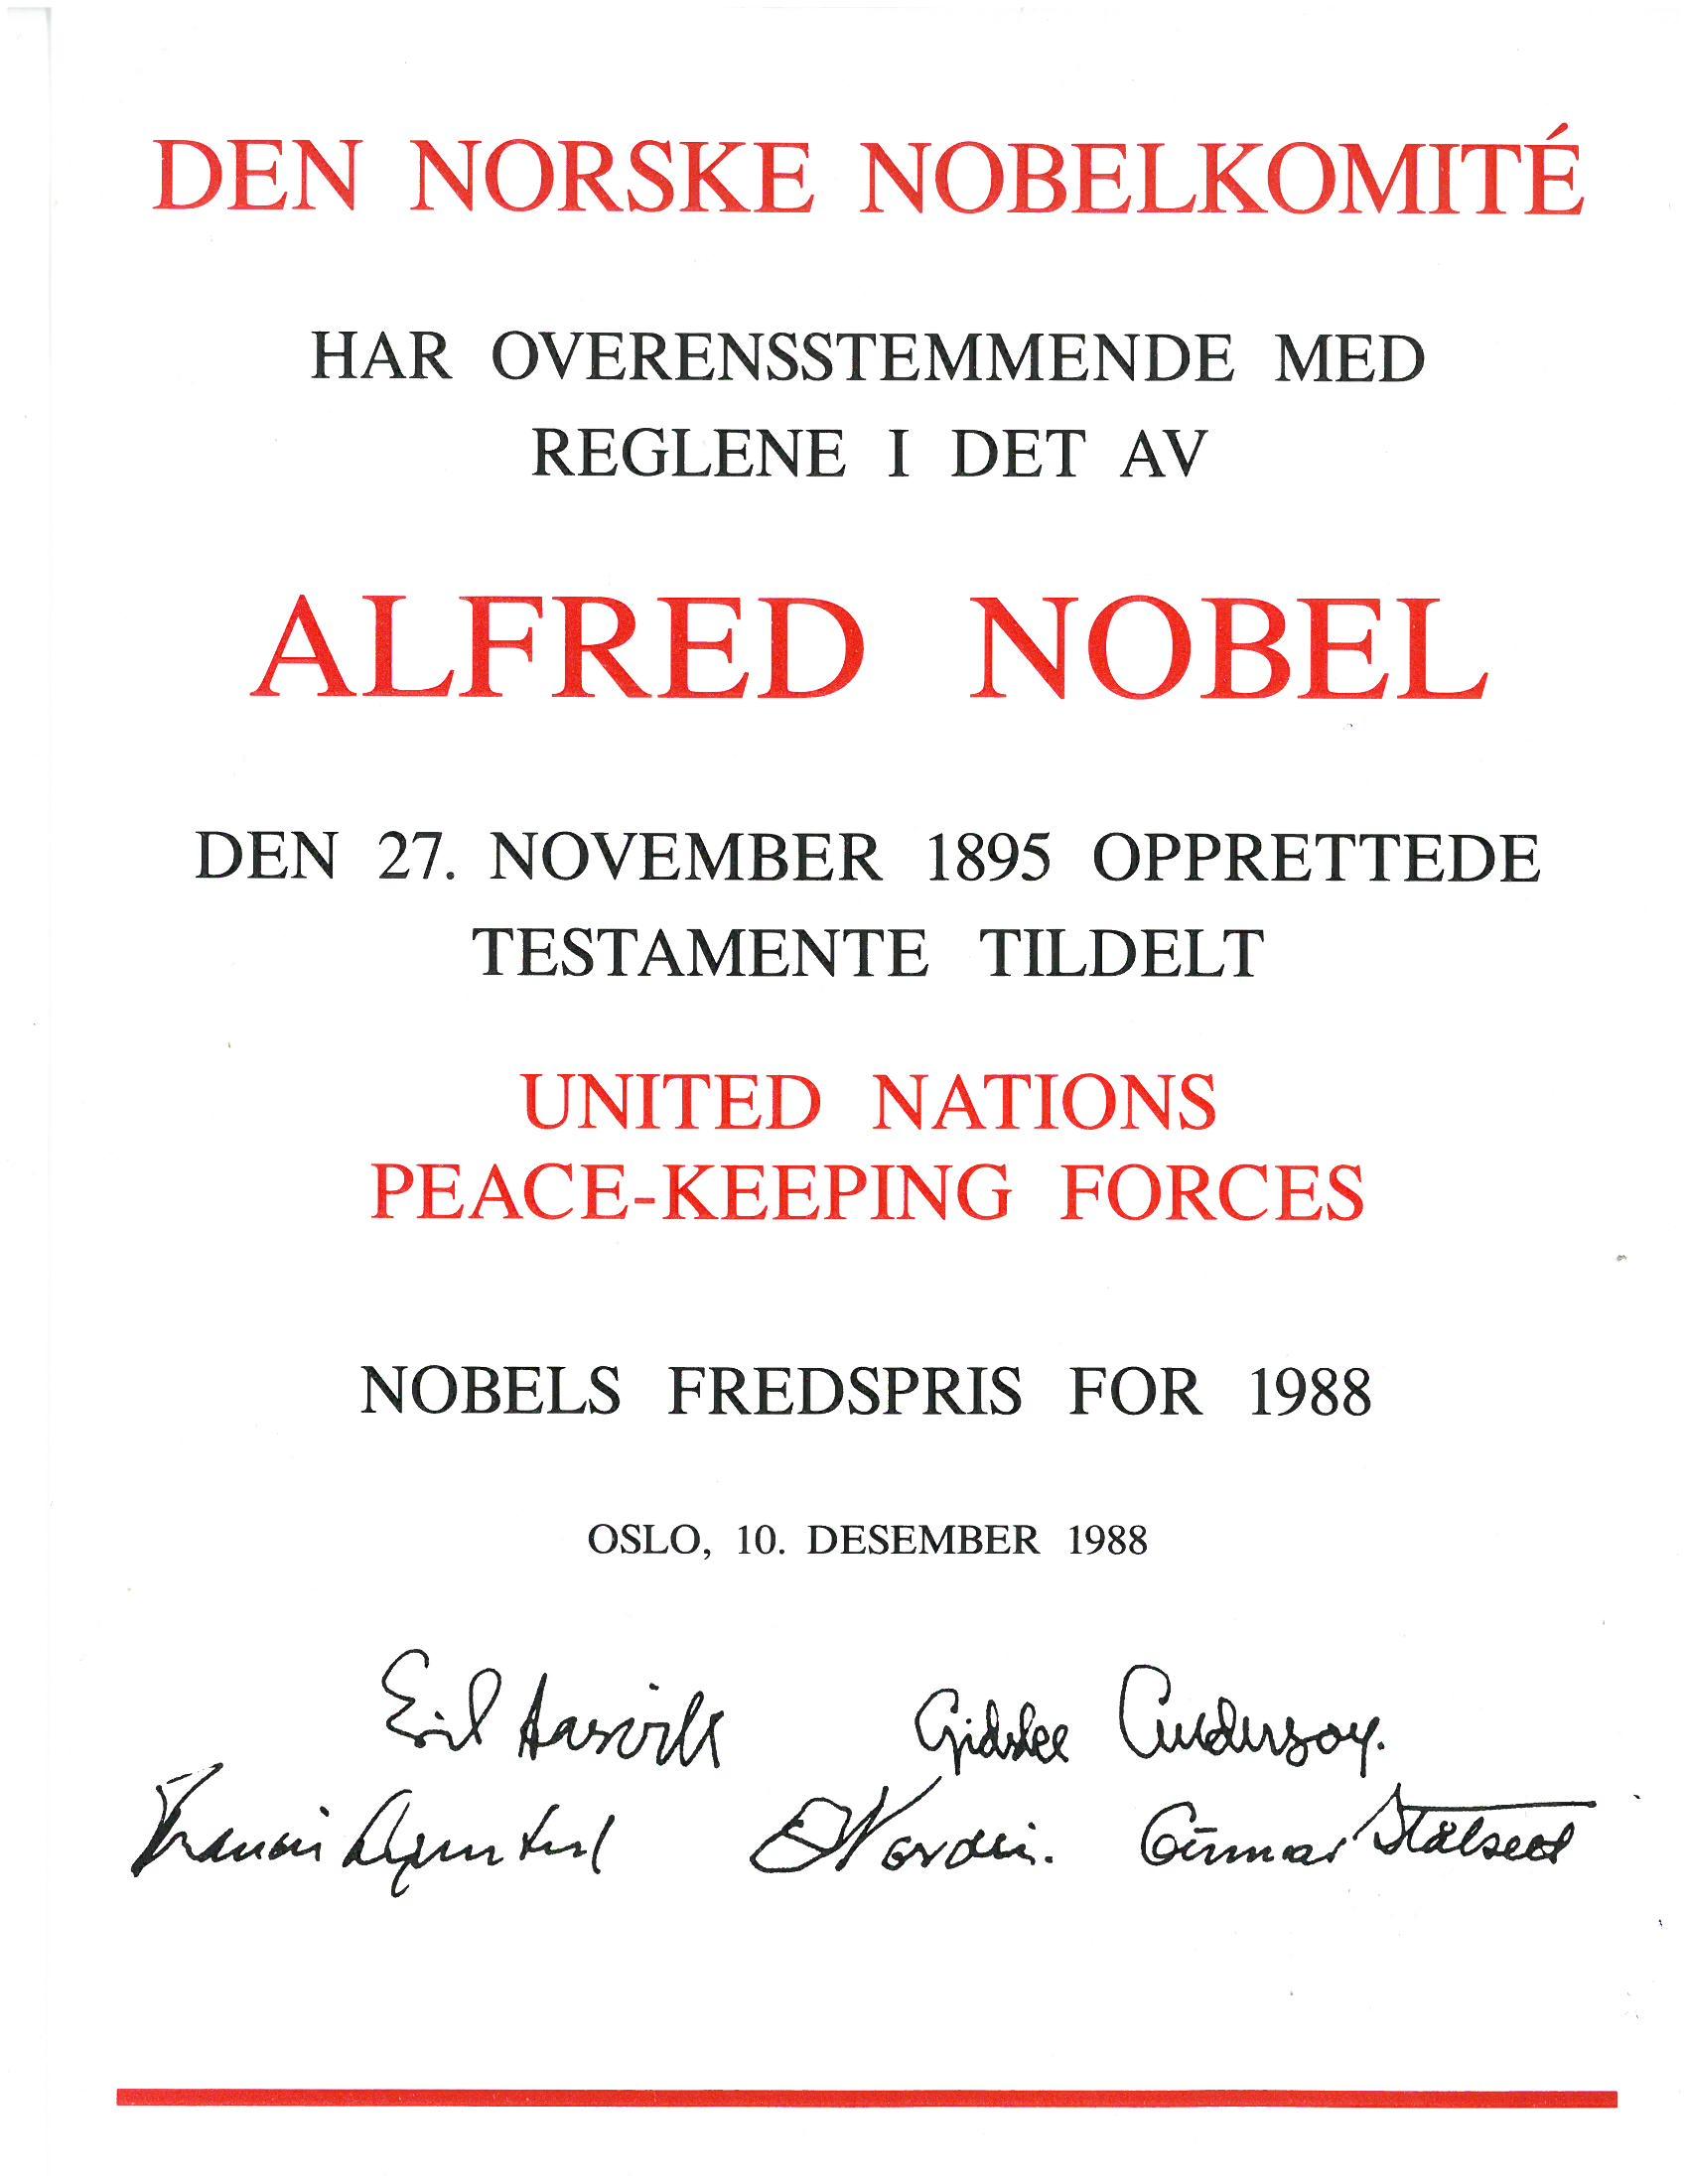 Nobel Prize document